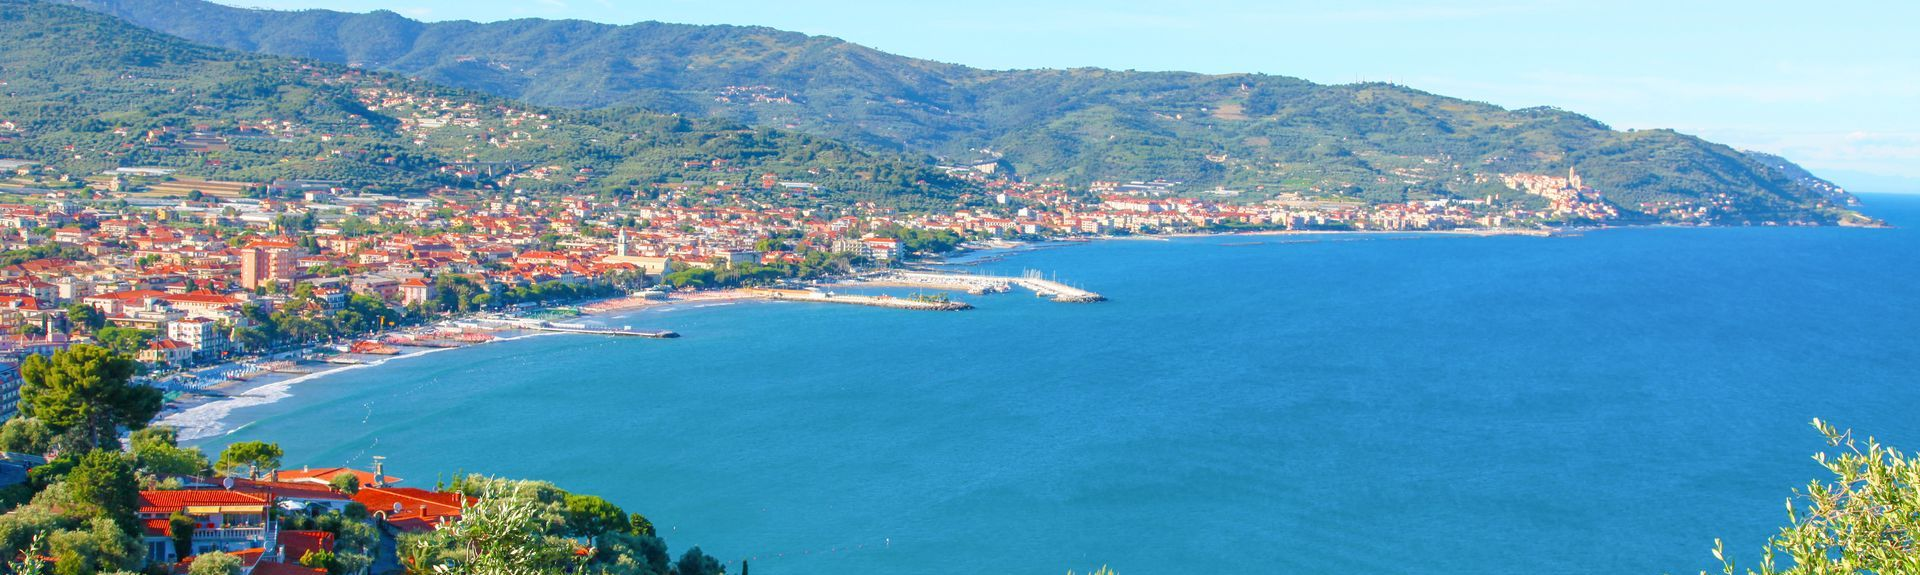 San Bartolomeo al Mare, Ligurie, Italie